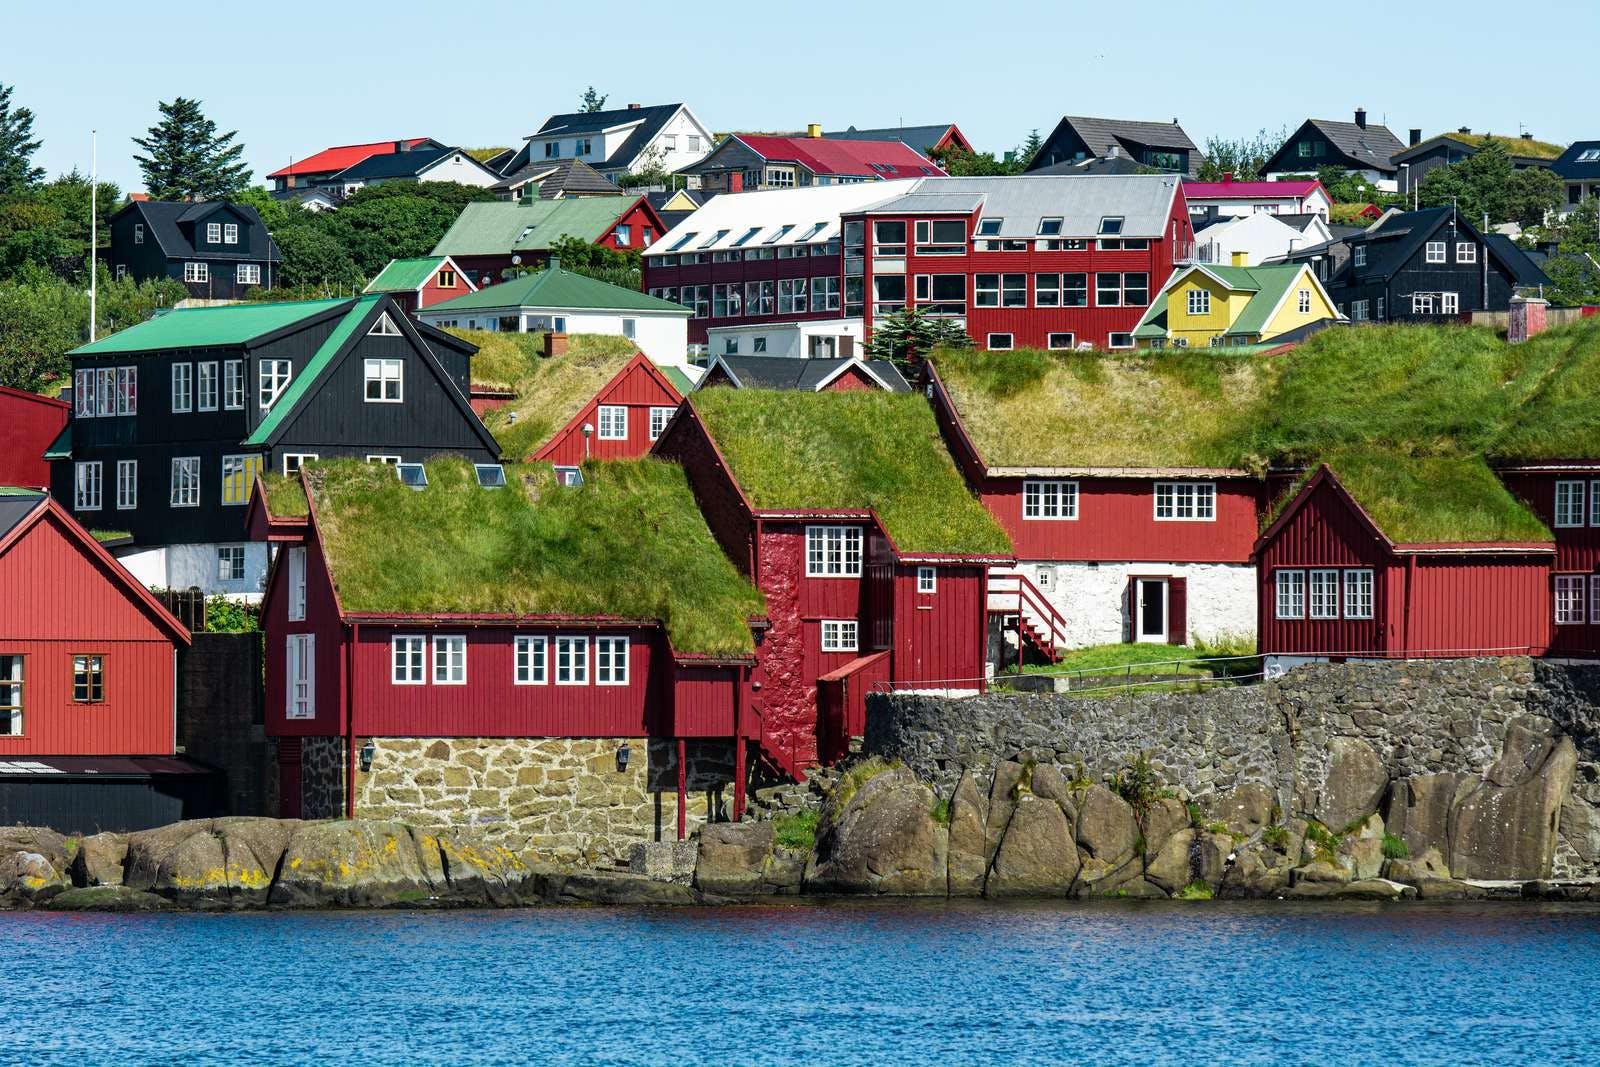 Houses in Thorshavn in the Faroe islands